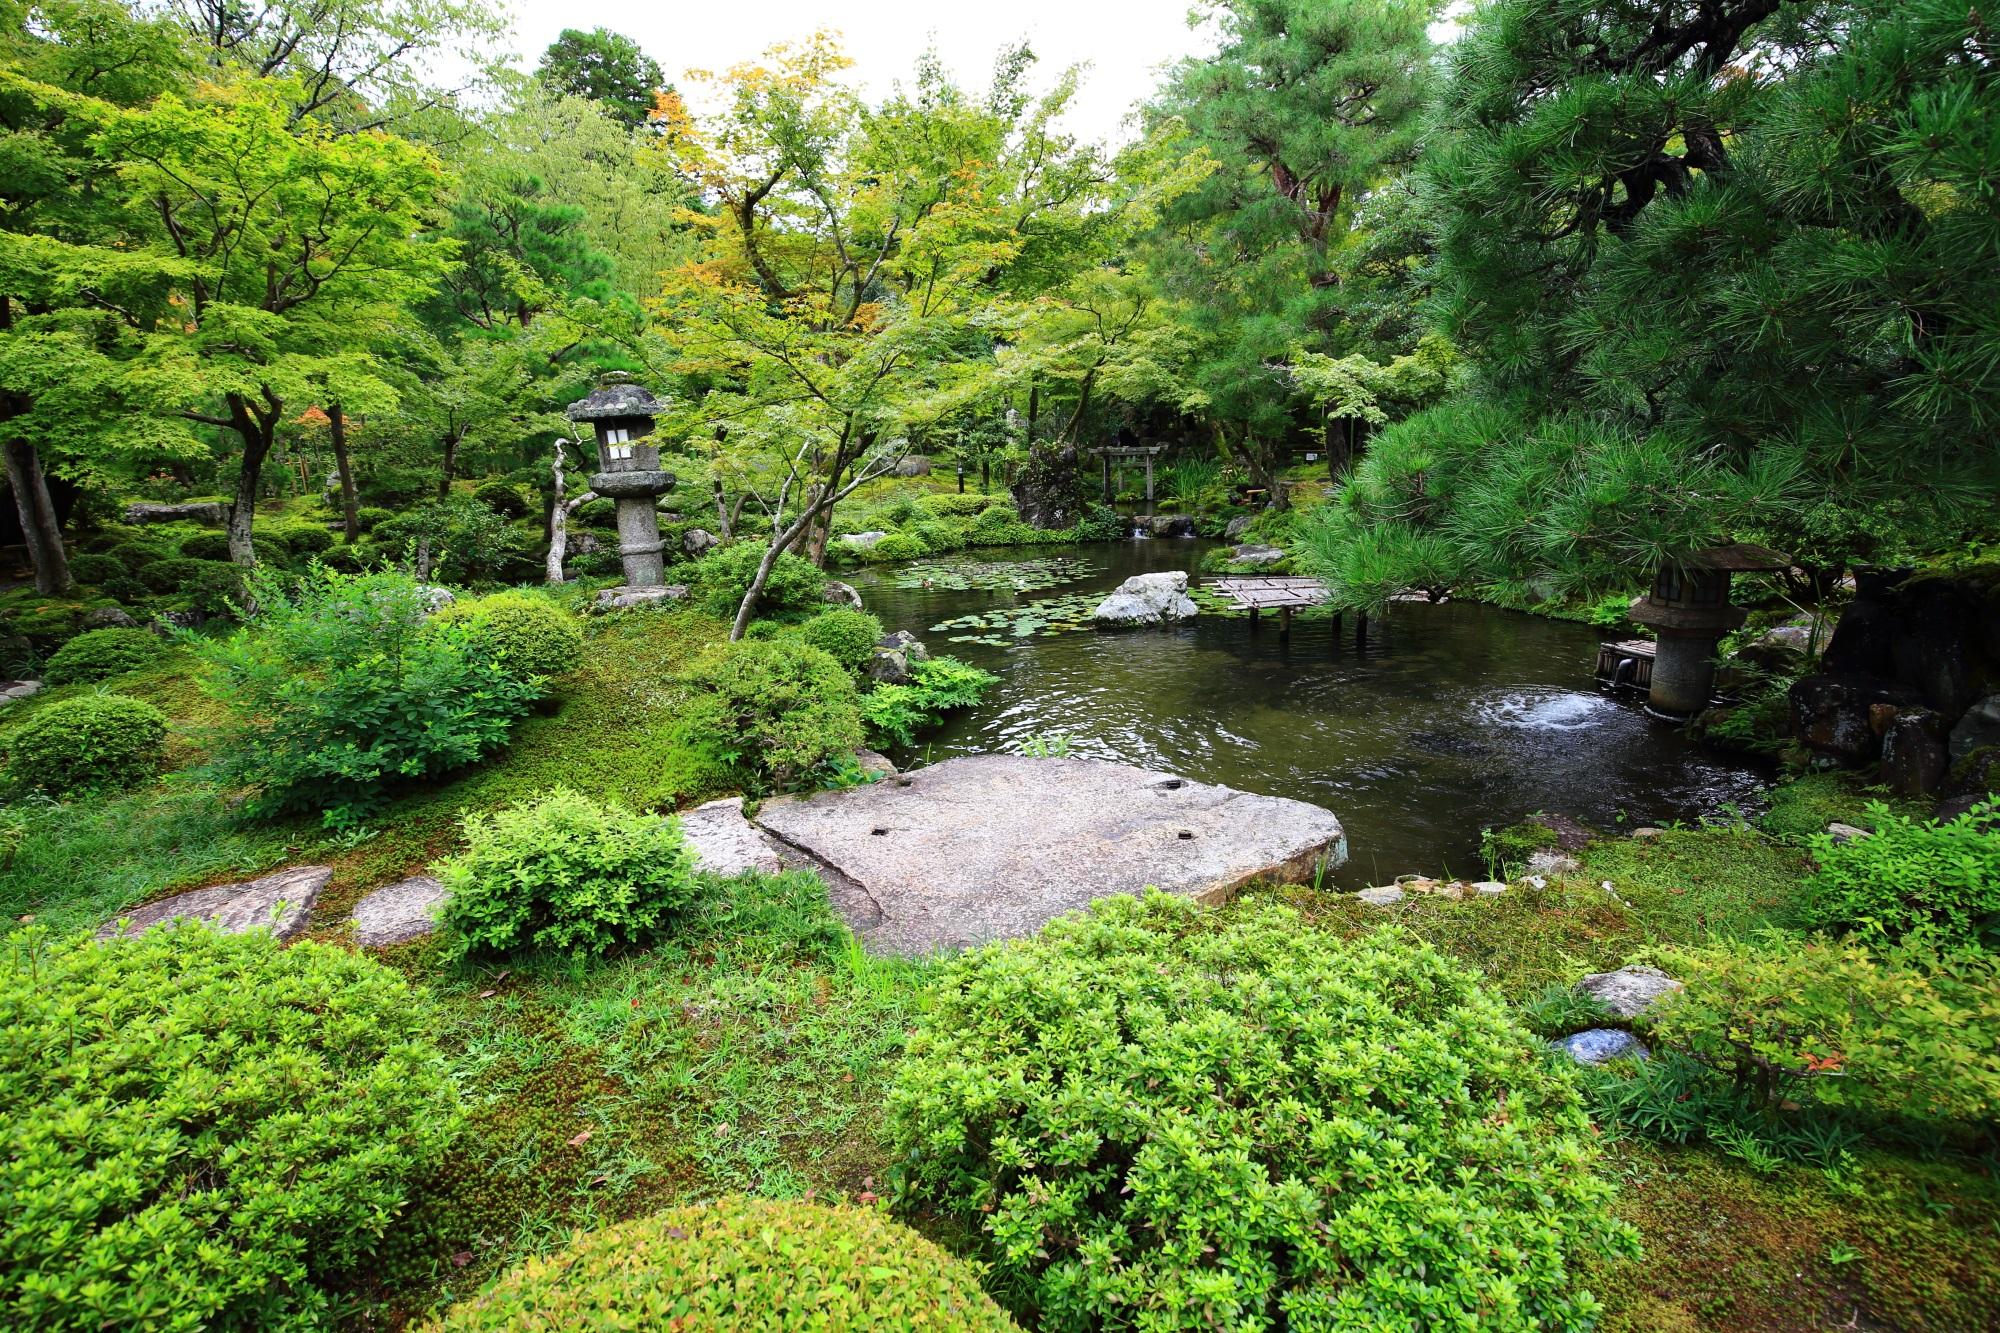 南禅寺大寧軒の池泉回遊式庭園